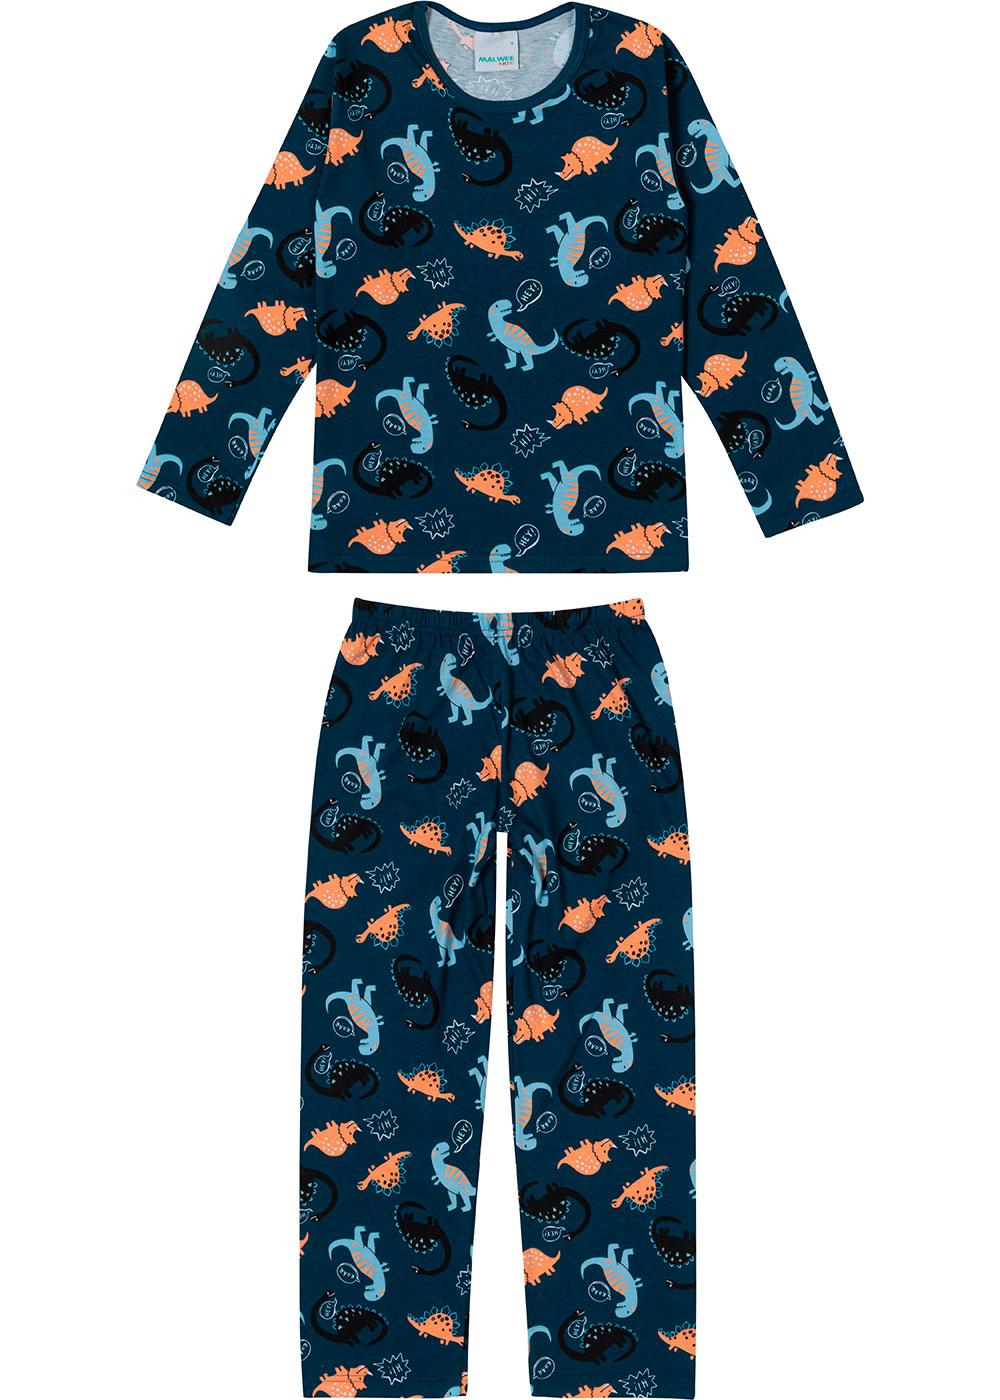 Pijama Infantil Masculino Longo Azul Dinossauros - Malwee